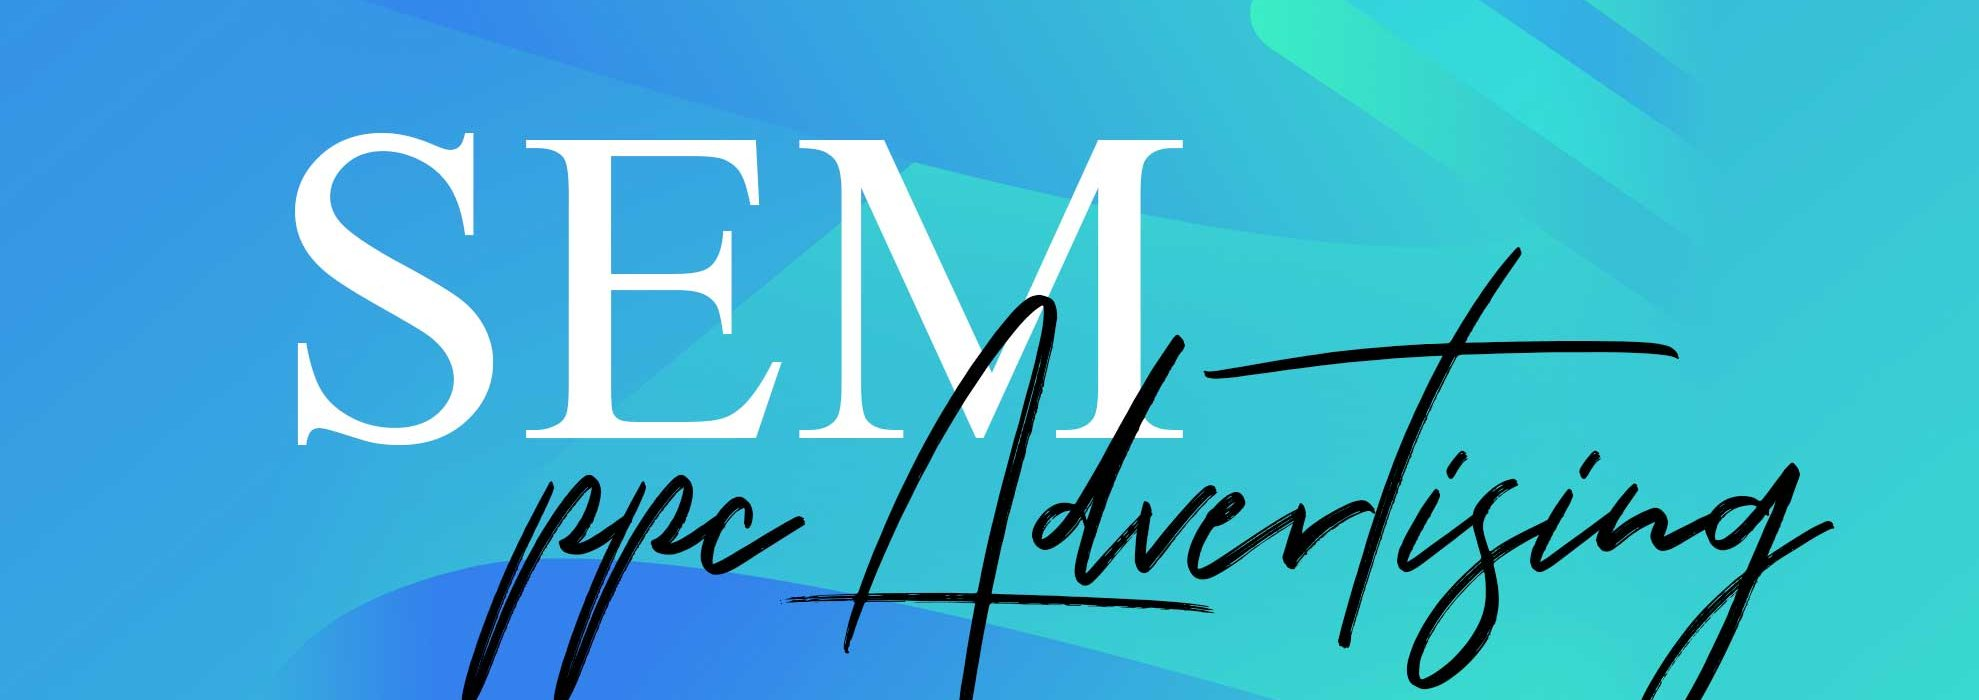 Miami Search Engine Marketing - SEM